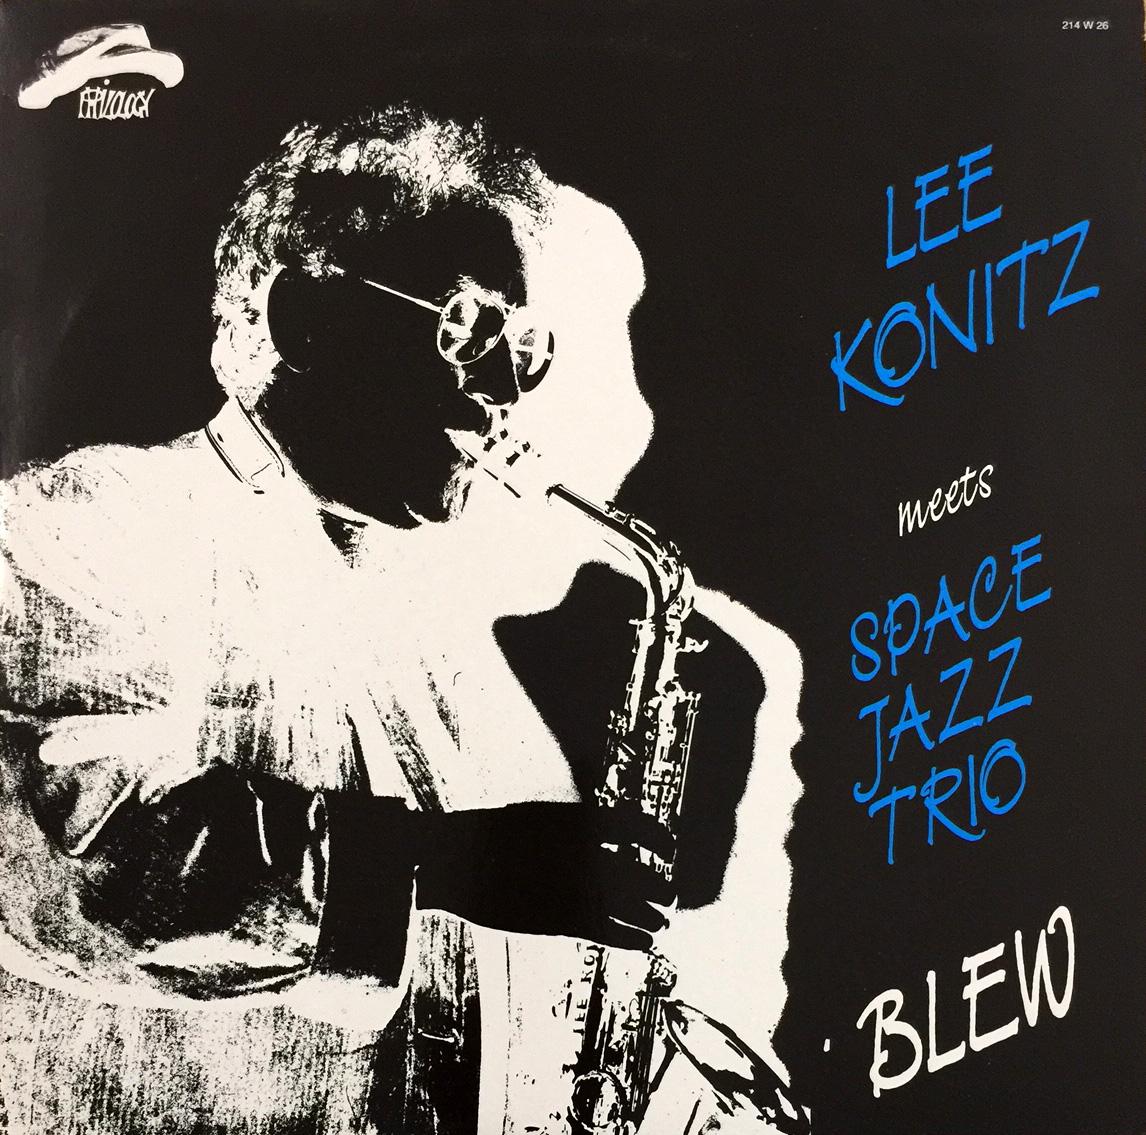 Lee Konitz -